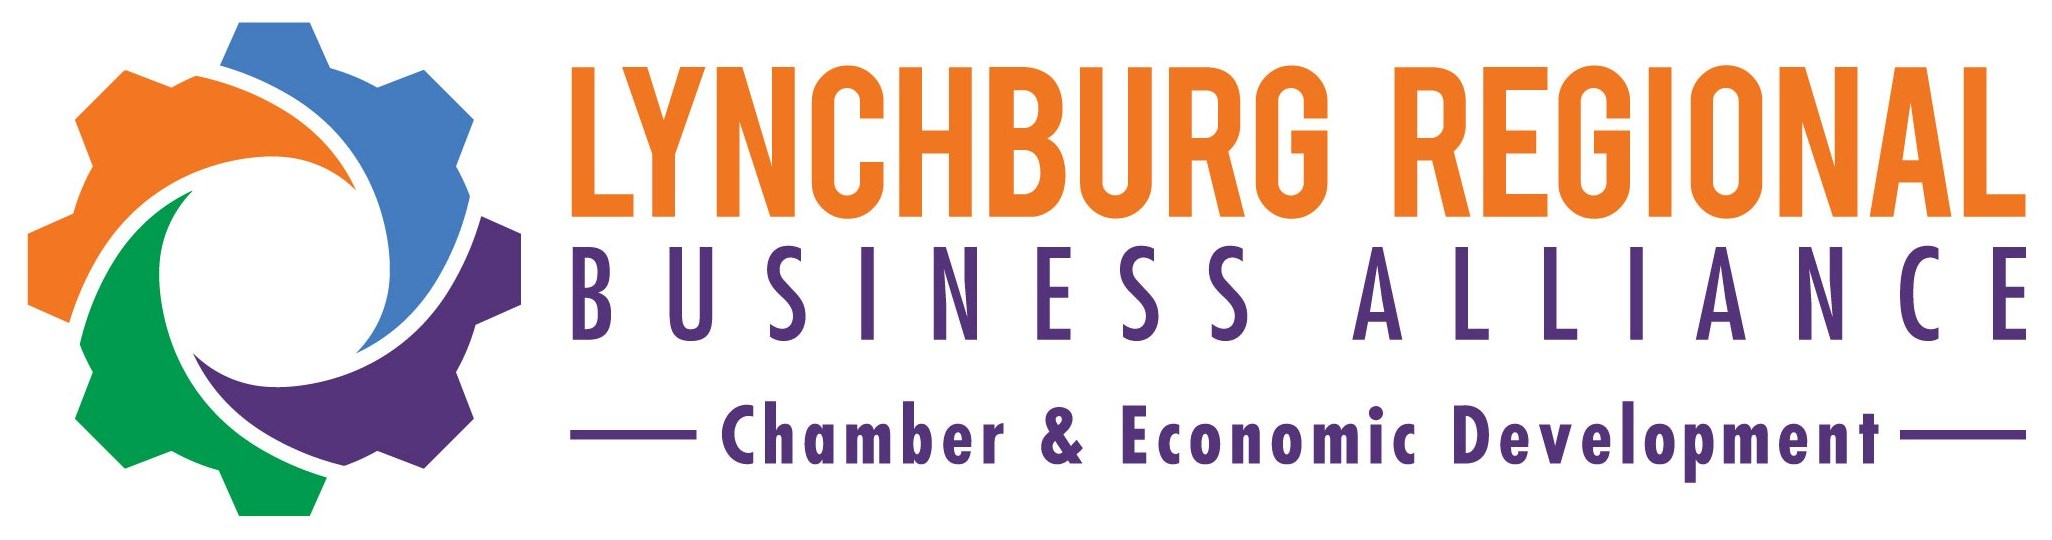 Lynchburg Regional Business Alliance | Valleys Innovation Council